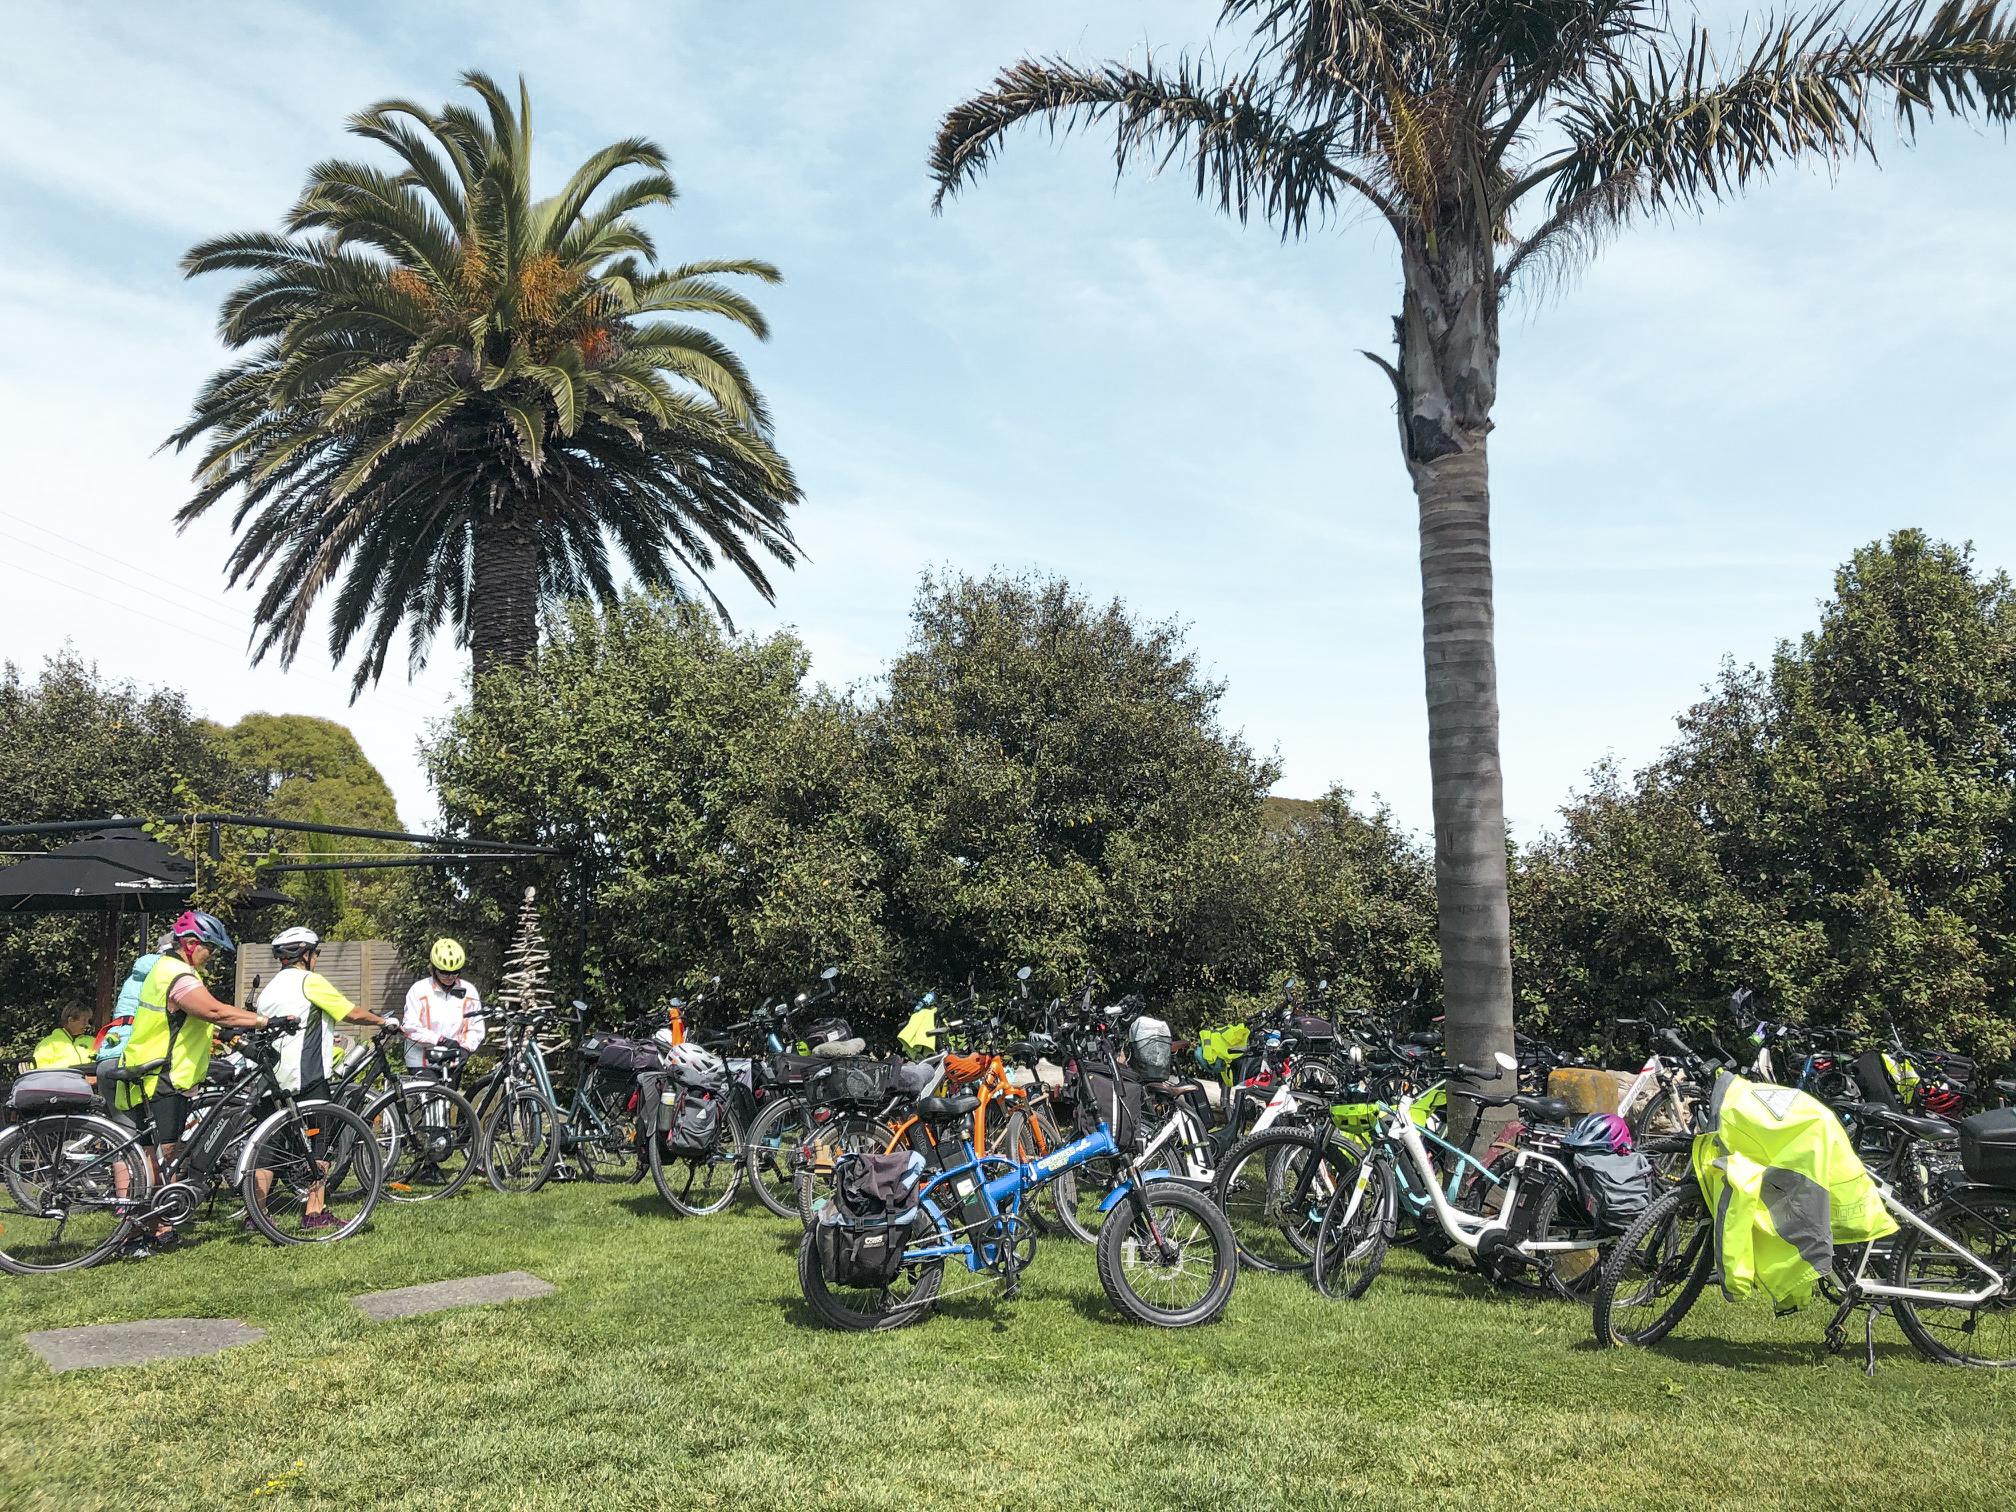 Bike rack on the lawn